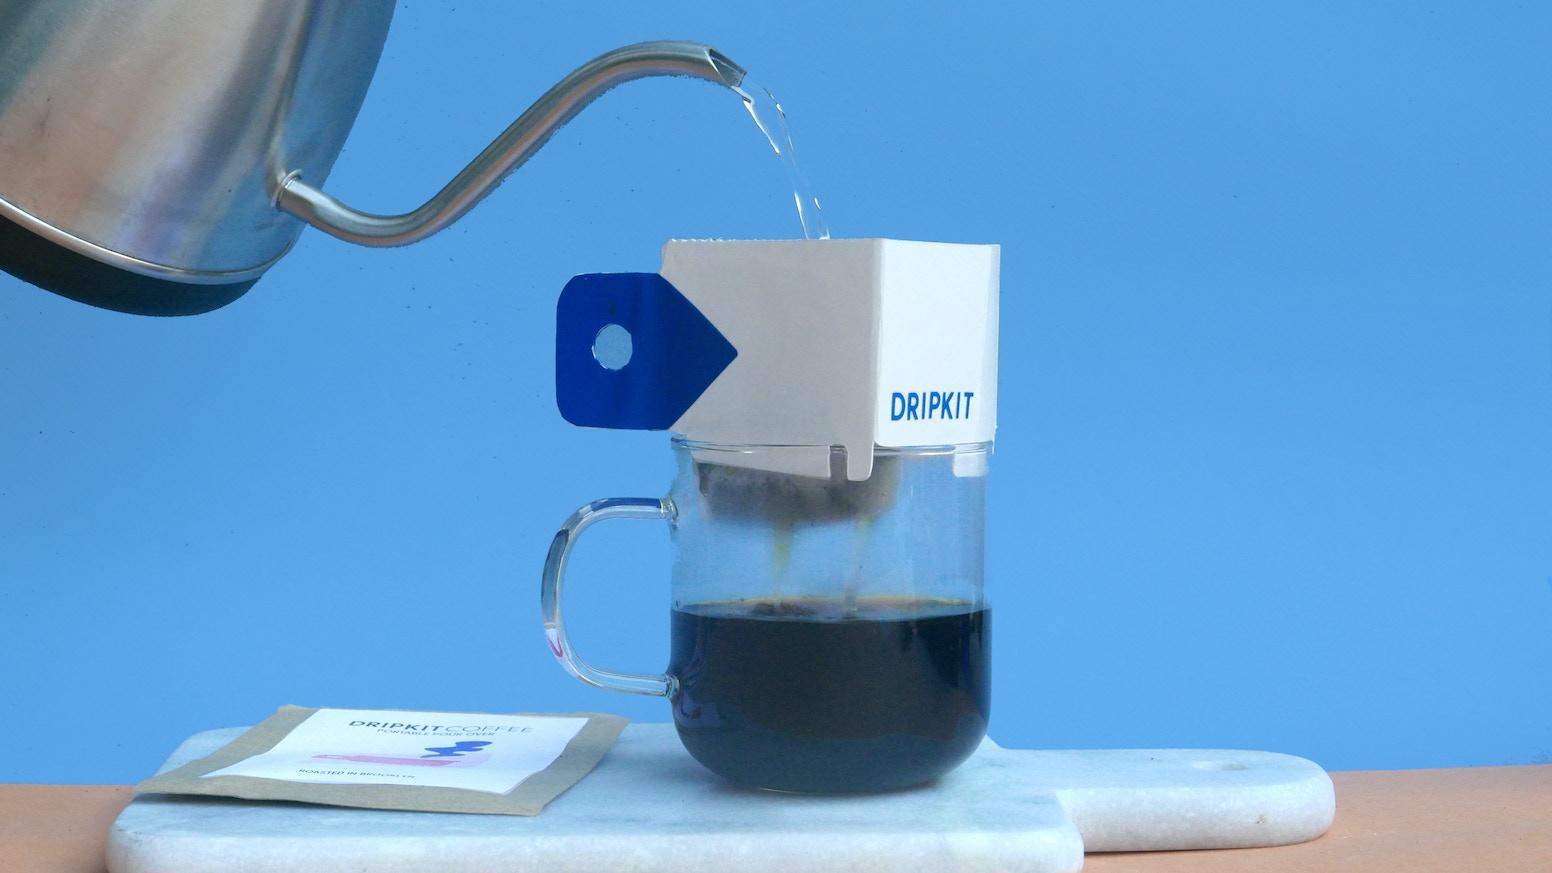 Dripkit, The Pocket-Sized Coffee Maker by Ilana Kruger + Kara Cohen ...